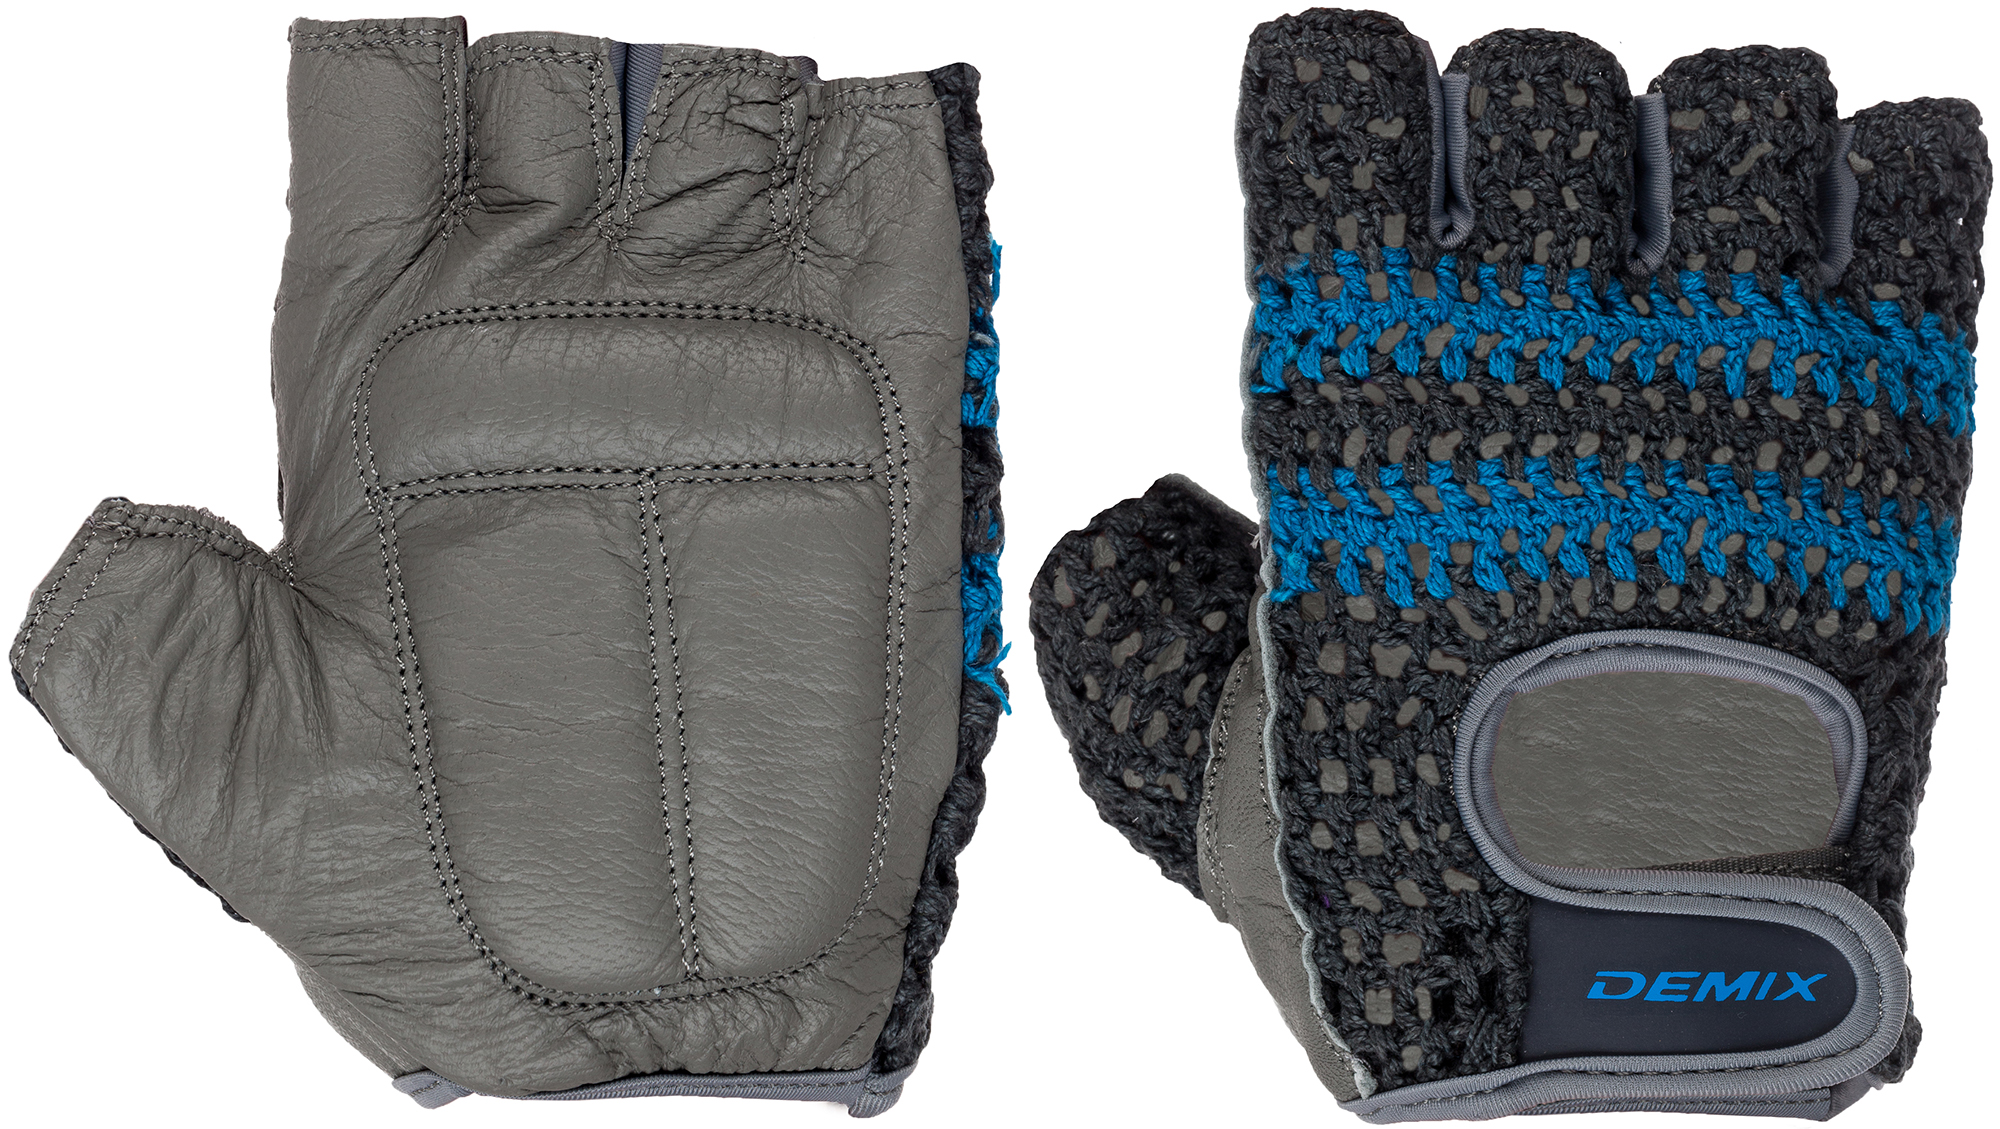 Demix Перчатки для фитнеса Demix, размер L